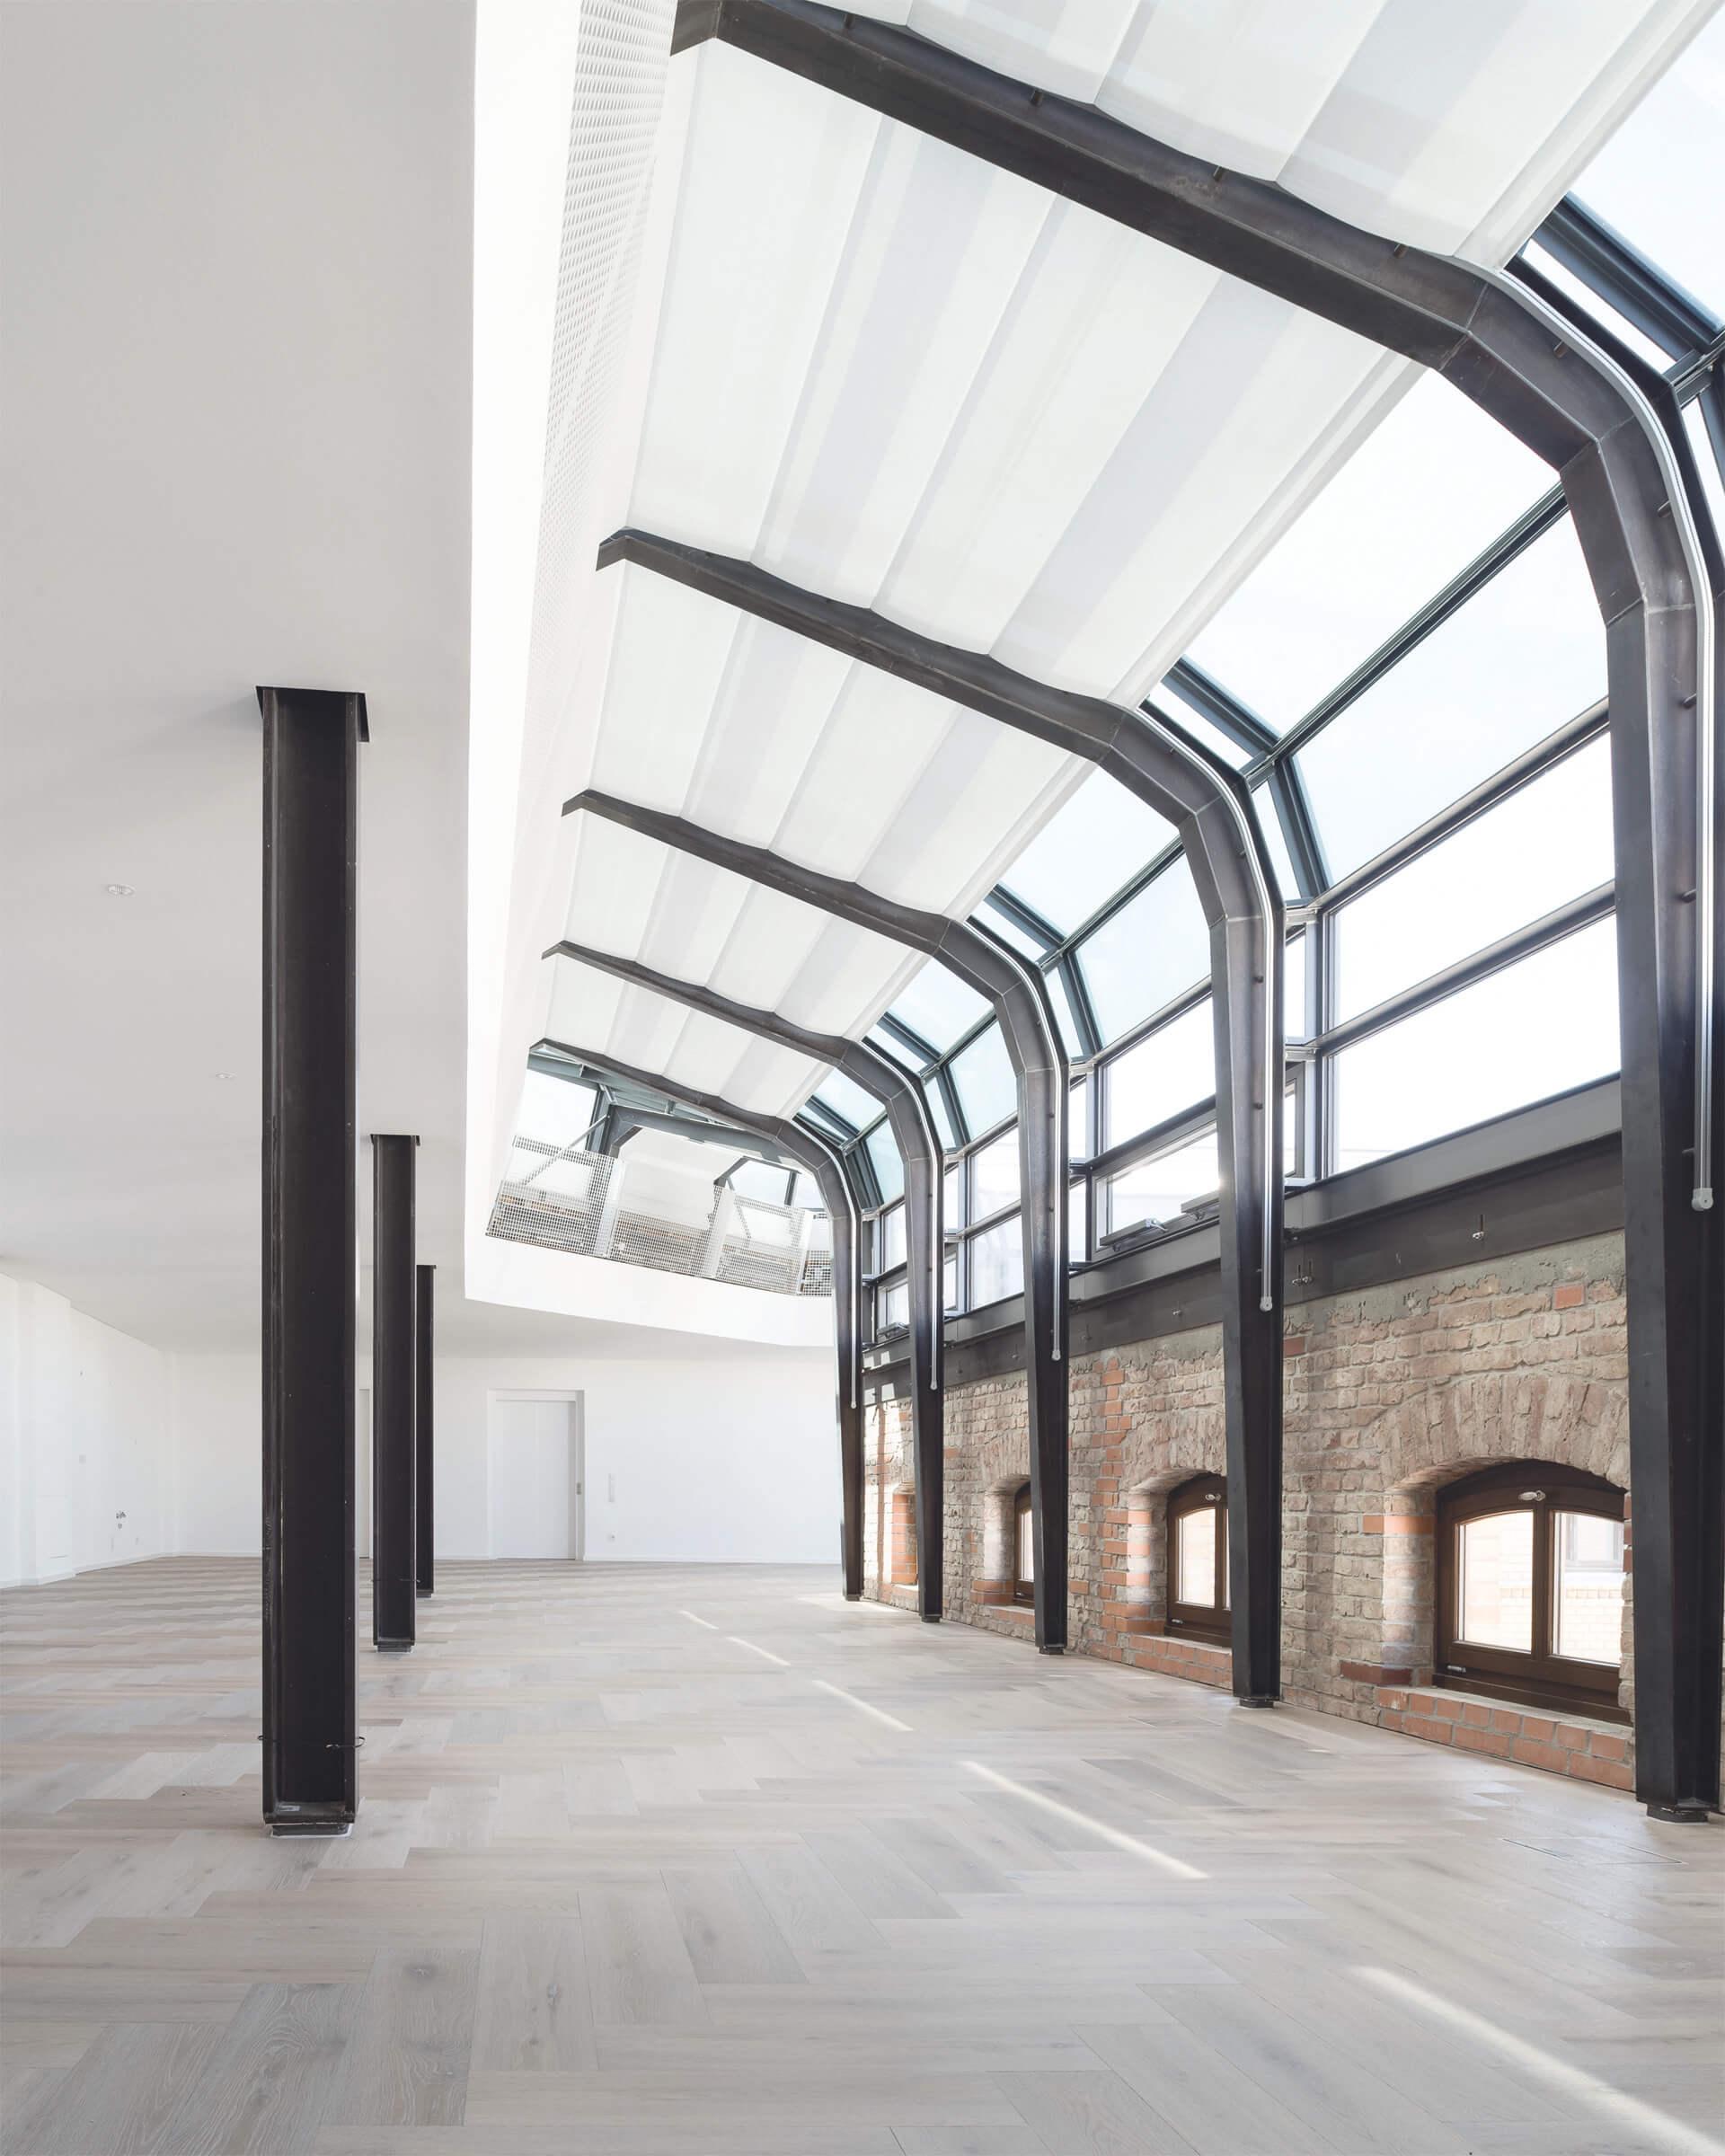 P91-18-architekturbildbureau-robert-herrmann_cmyk_